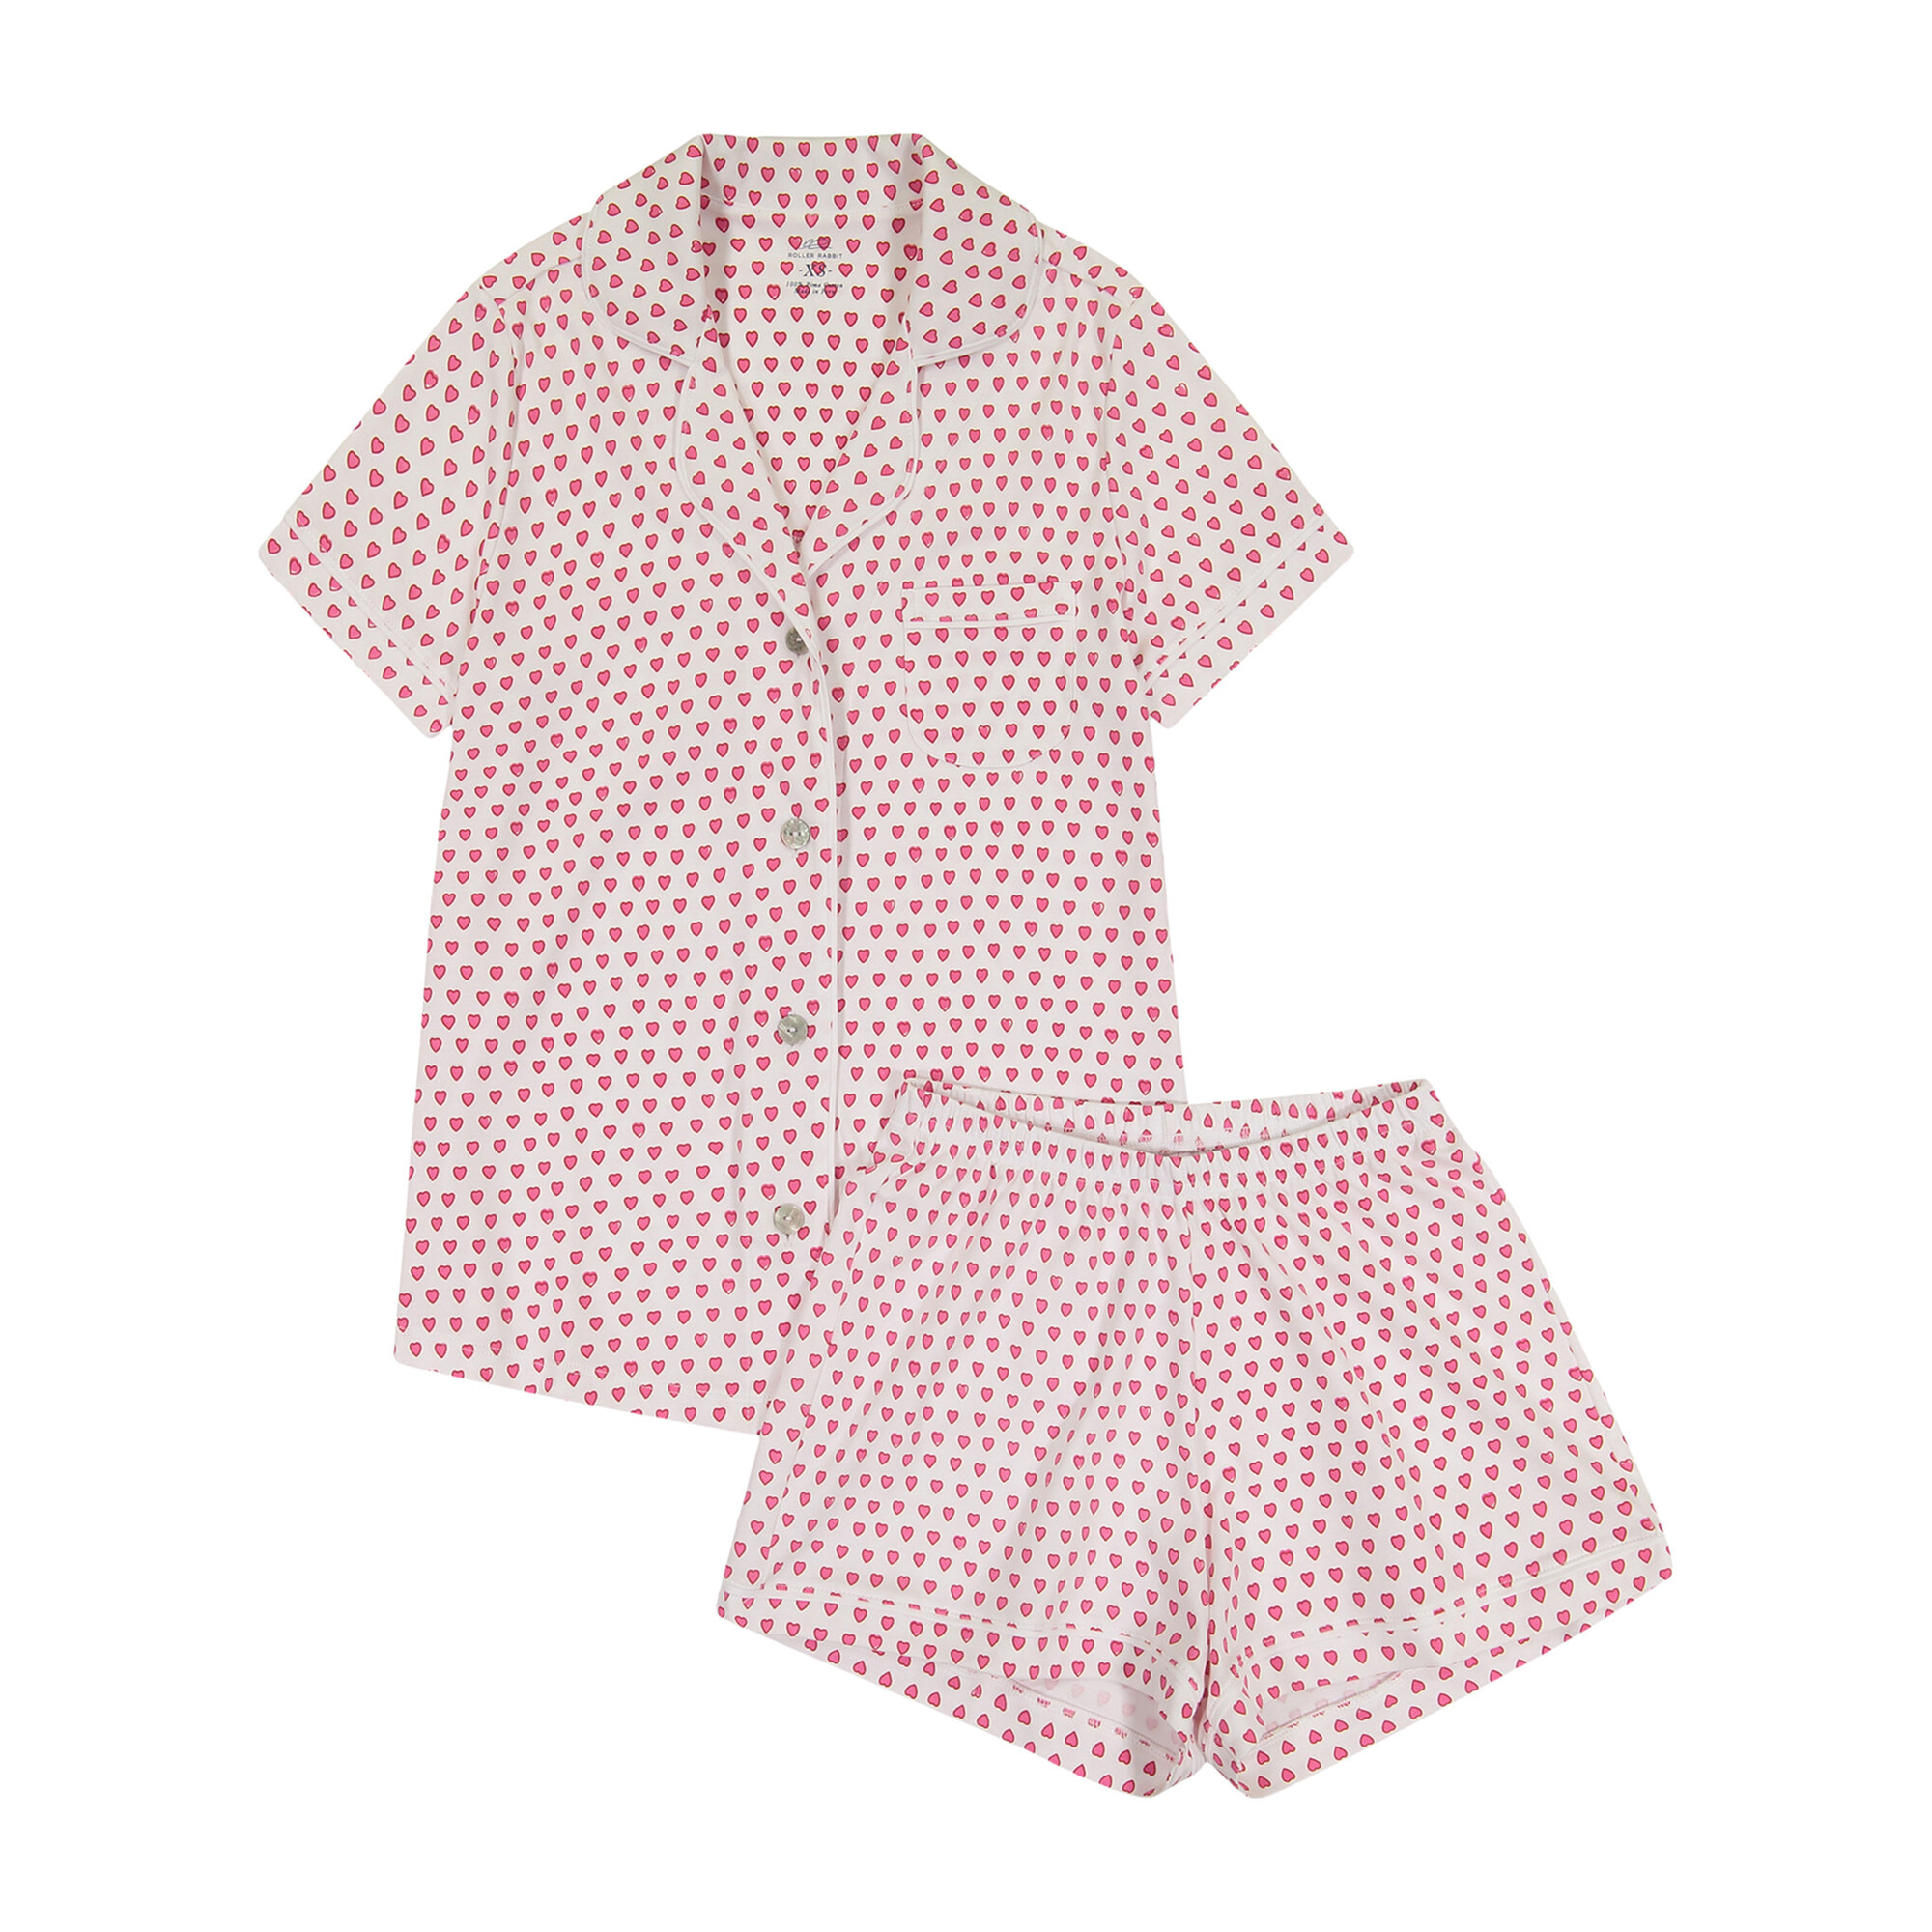 Women's Hearts Polo Pajama Set, Pink